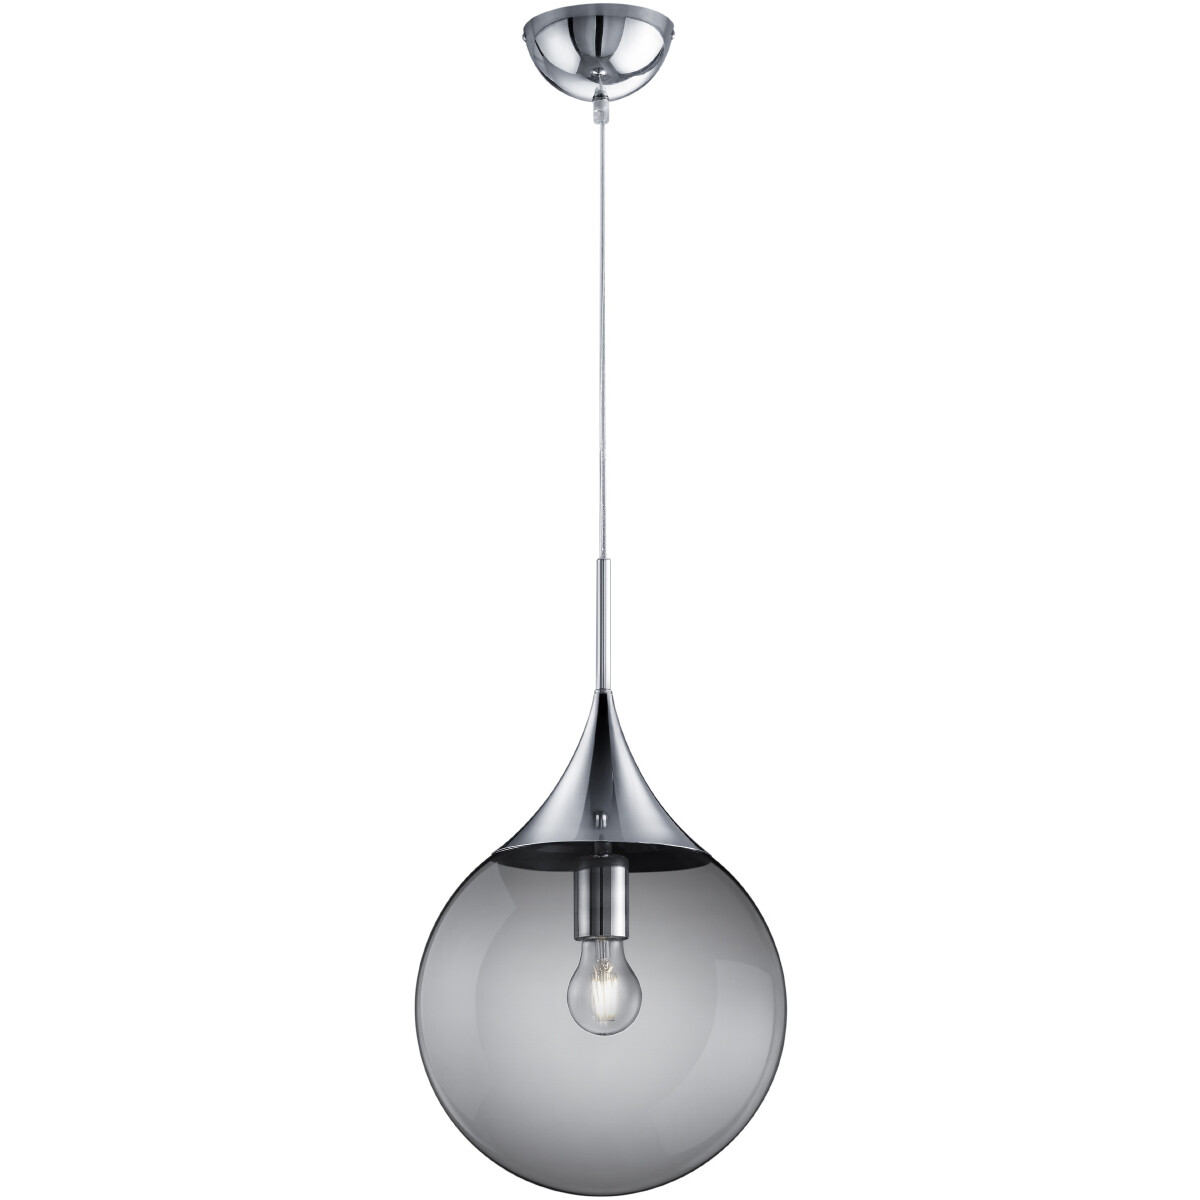 LED Hanglamp - Hangverlichting - Trion Midon - E27 Fitting - Rond - Mat Chroom - Aluminium